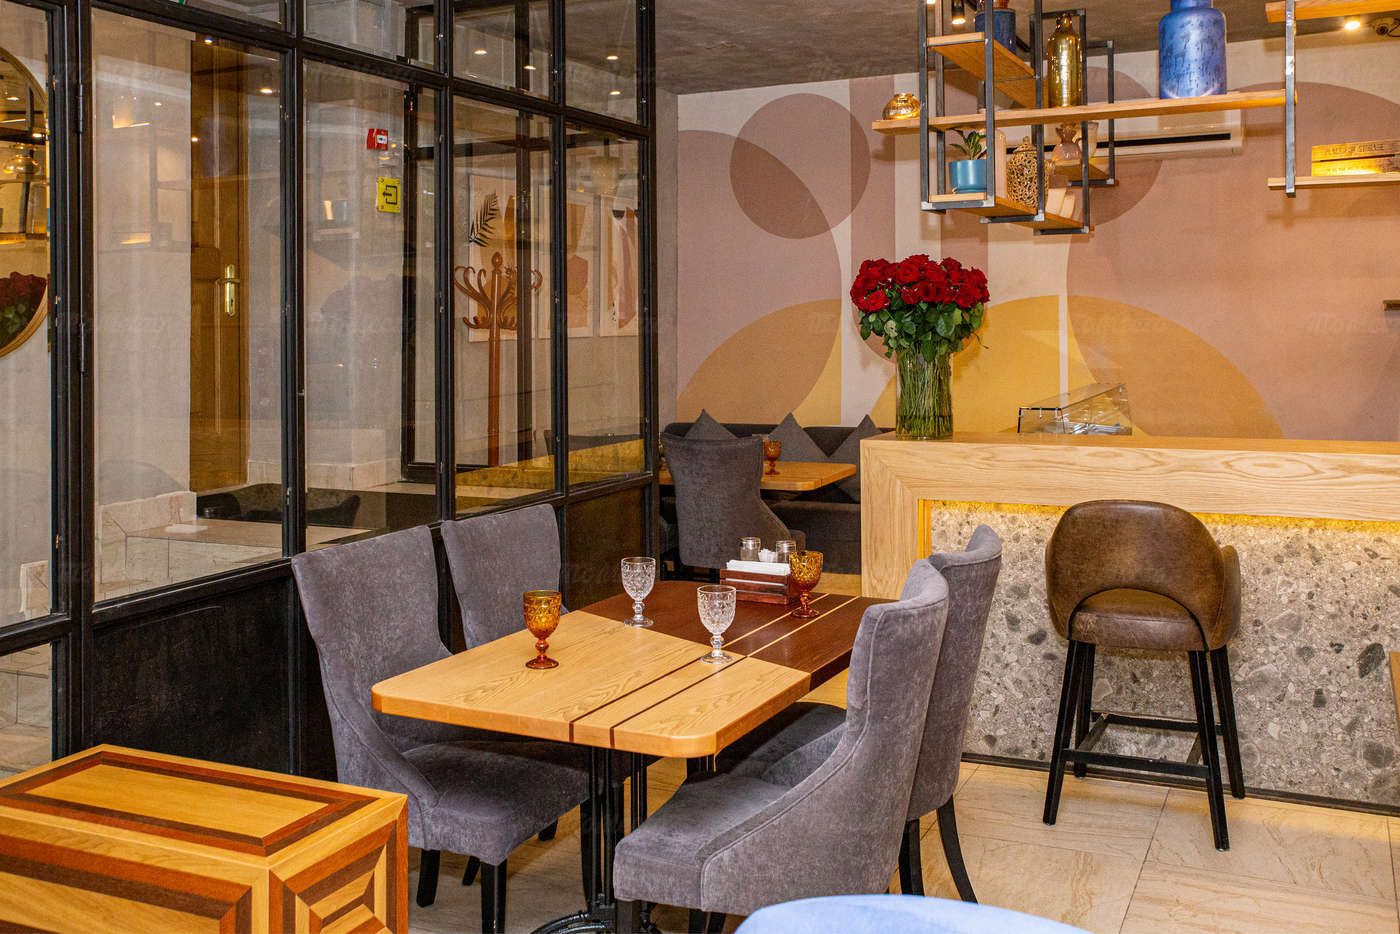 Ресторан IL LETTERATO (Литератор) в Петроверигском переулке фото 29